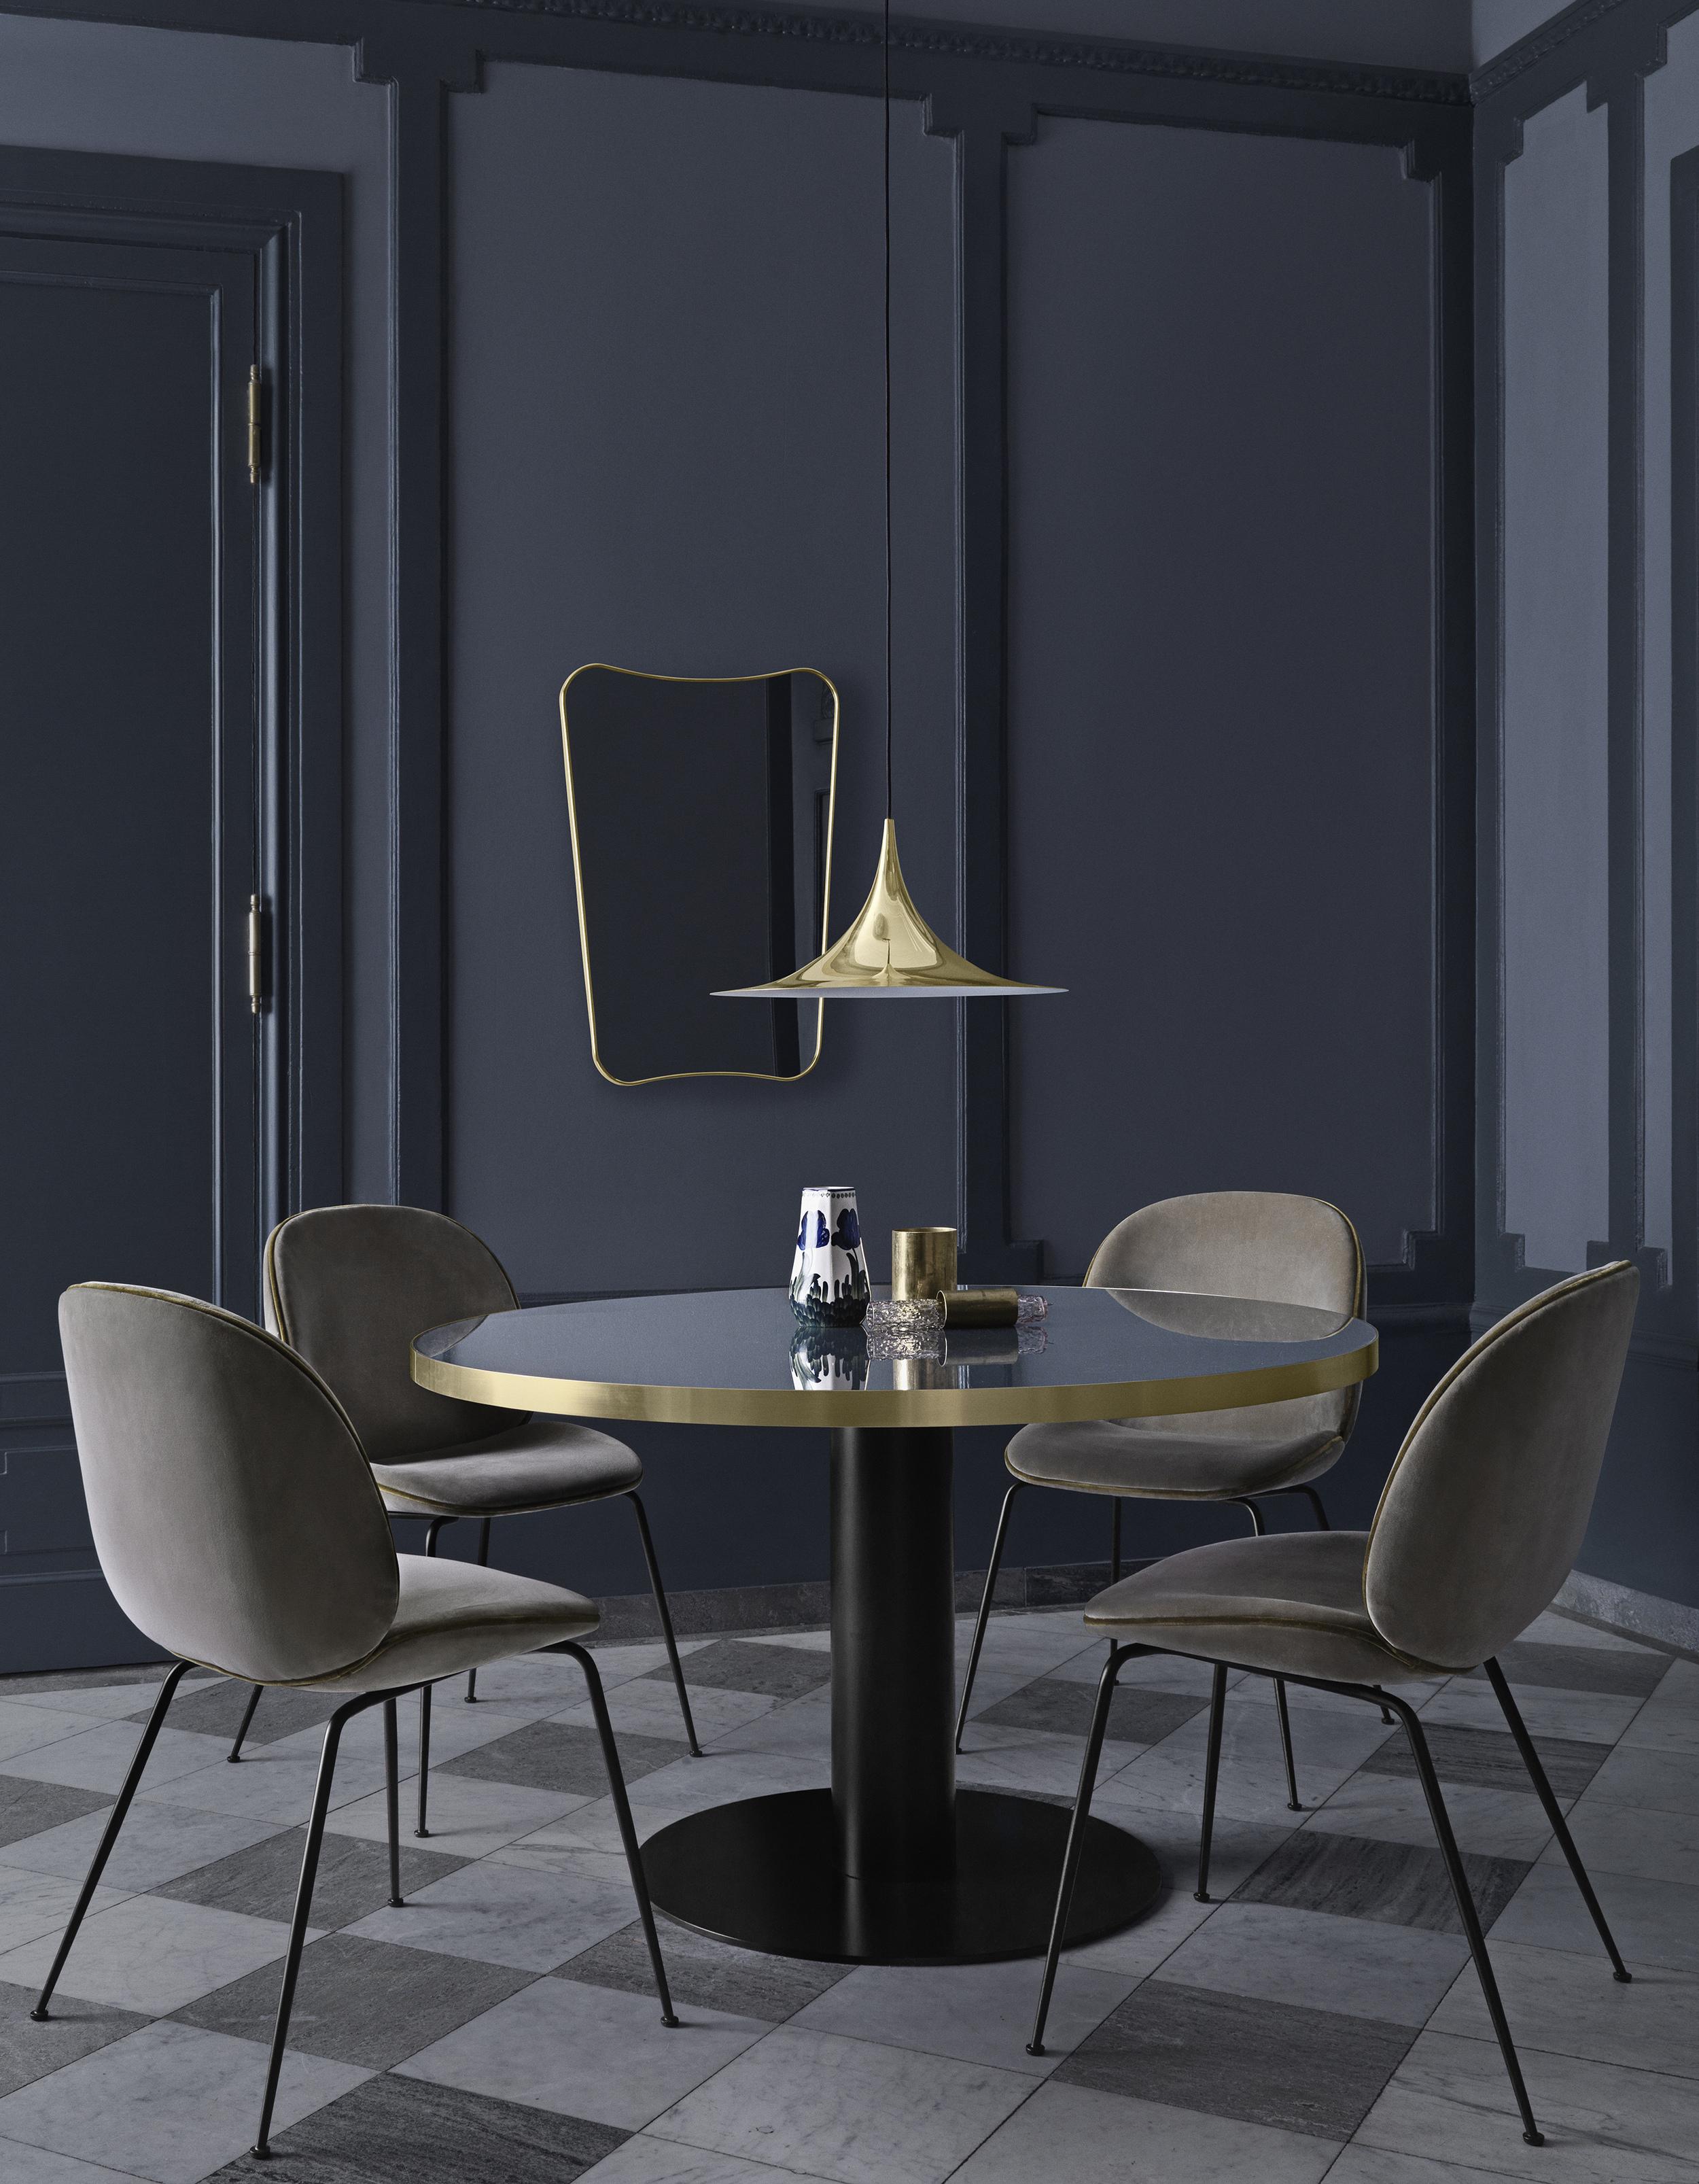 Beetle chair - Velluto di Cotone 294, piping 1180_Gubi table 2.0 - granite grey_Semi pendant Ø47- brass_F.A. 33 mirror.jpg